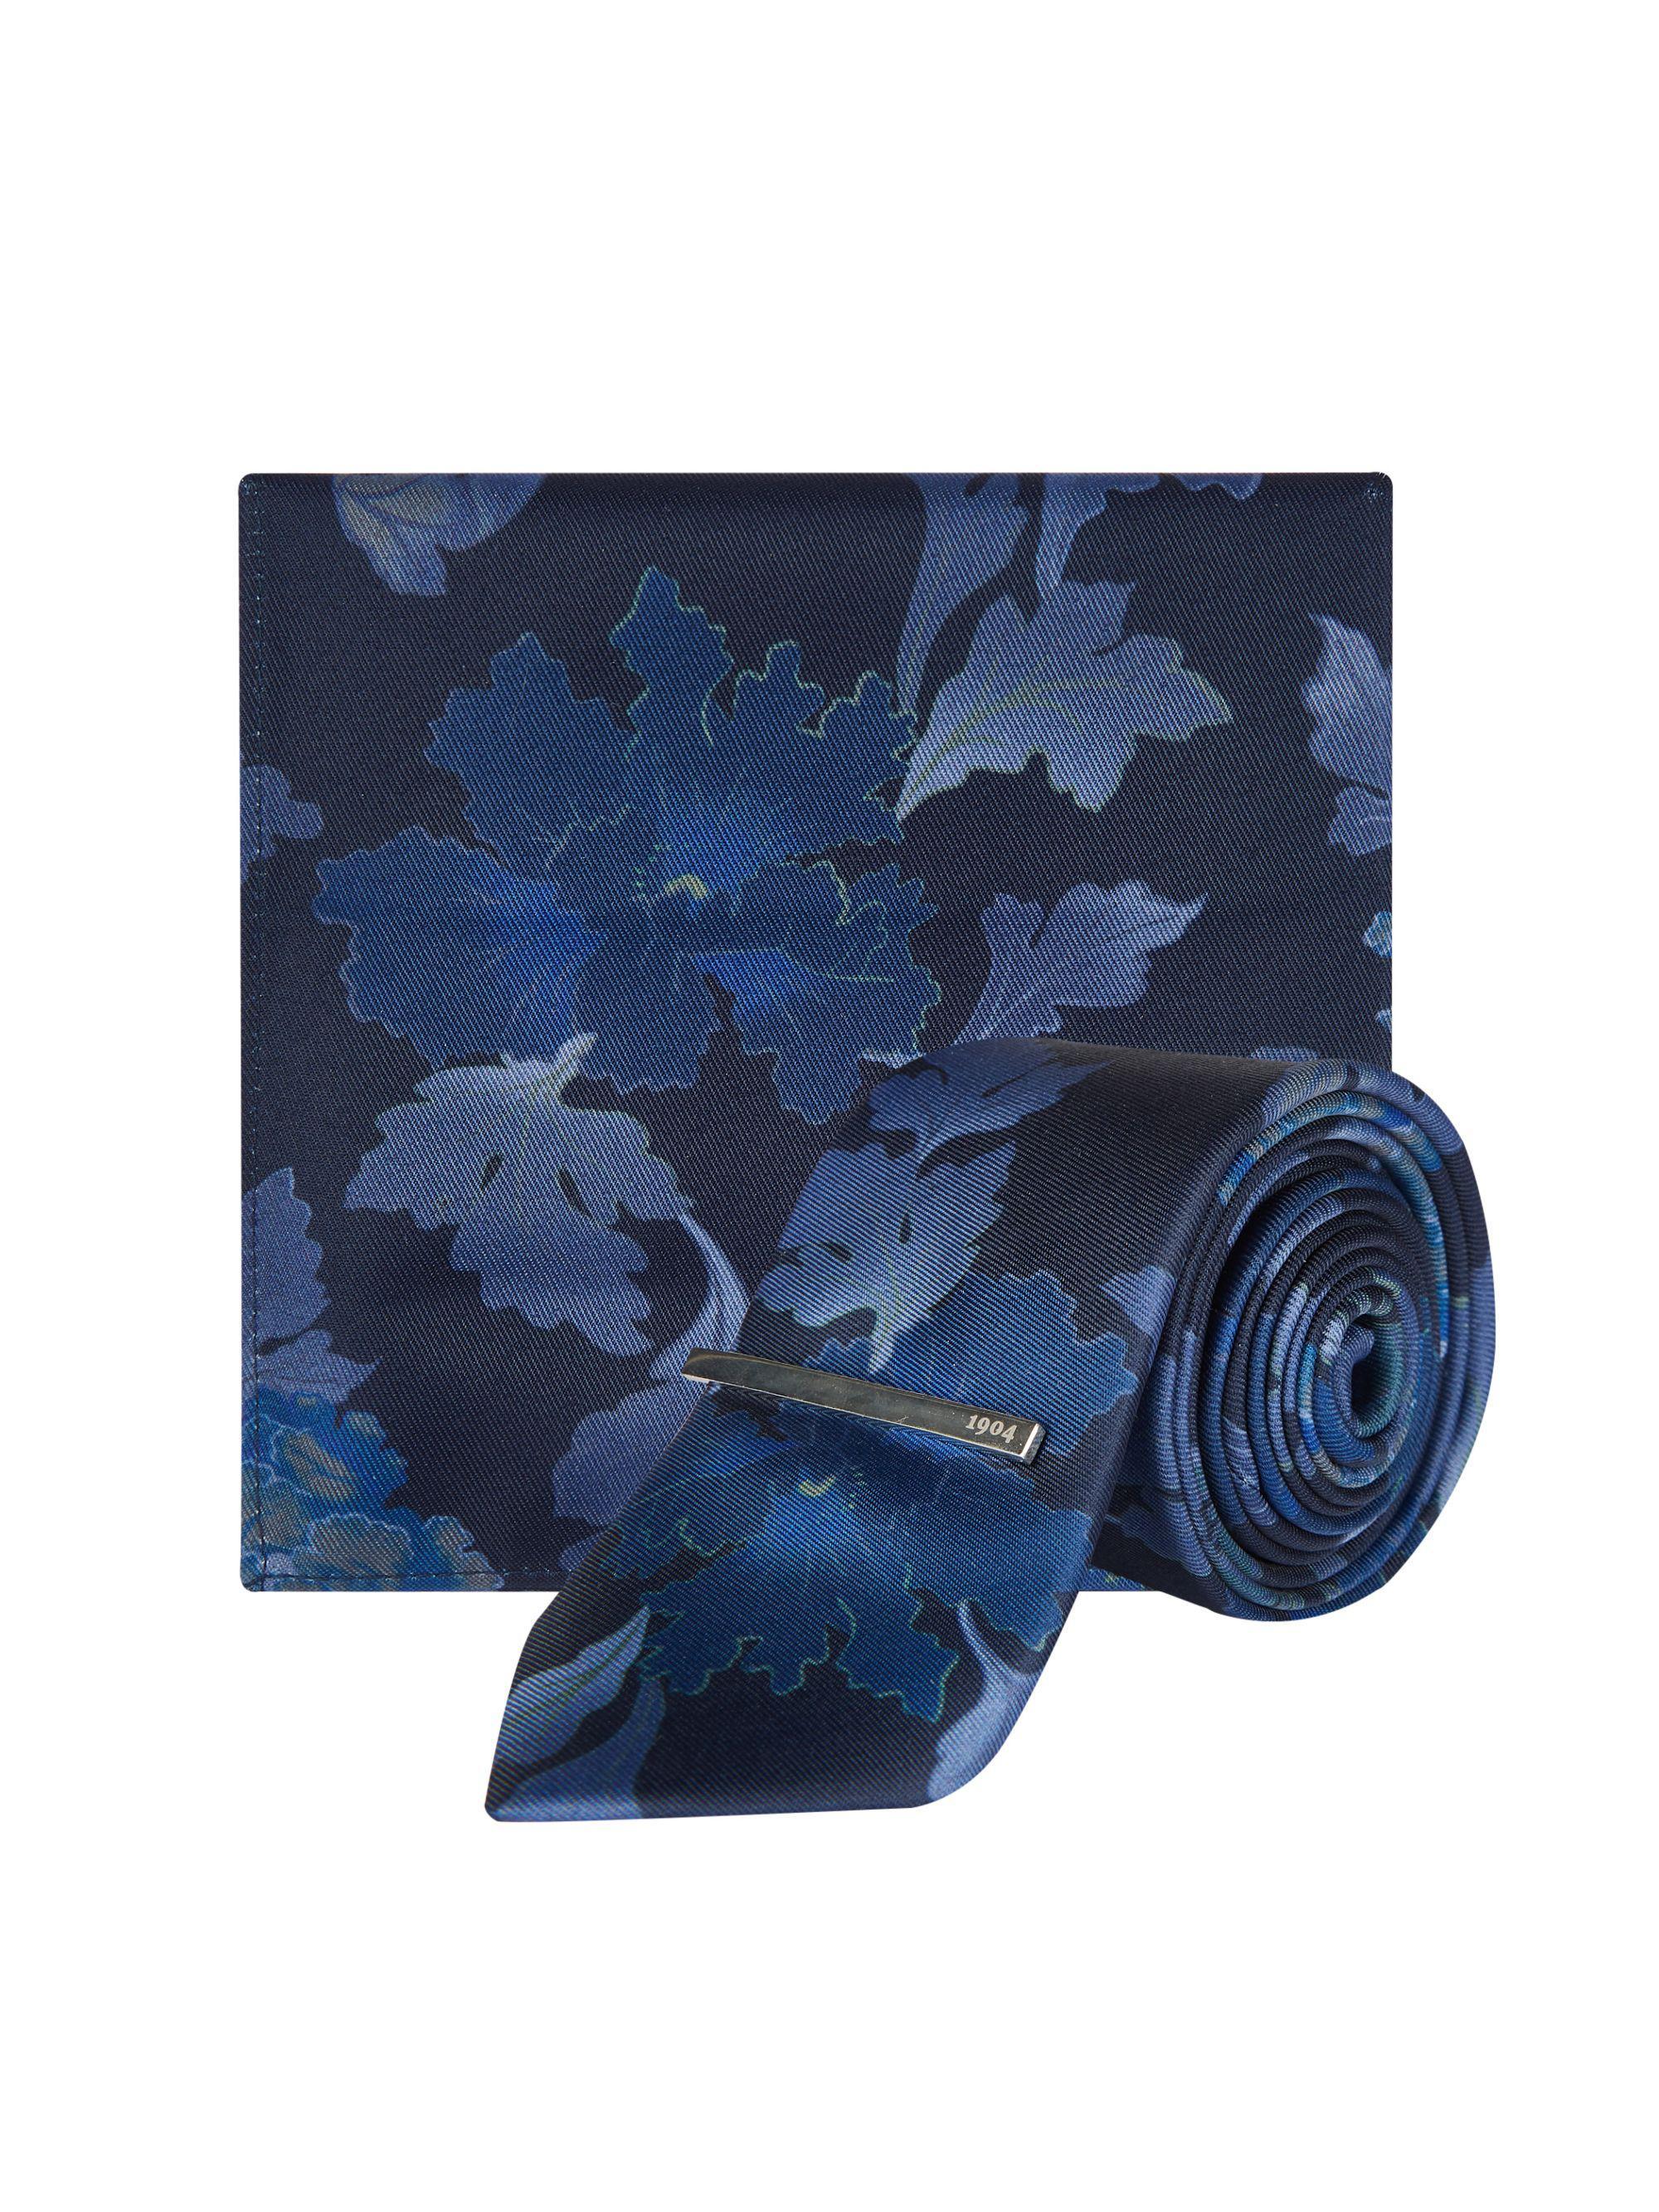 cd1b55ef7090 Burton - Blue 1904 Navy Floral Print Tie, Pocket Square And Clip Set for Men.  View fullscreen